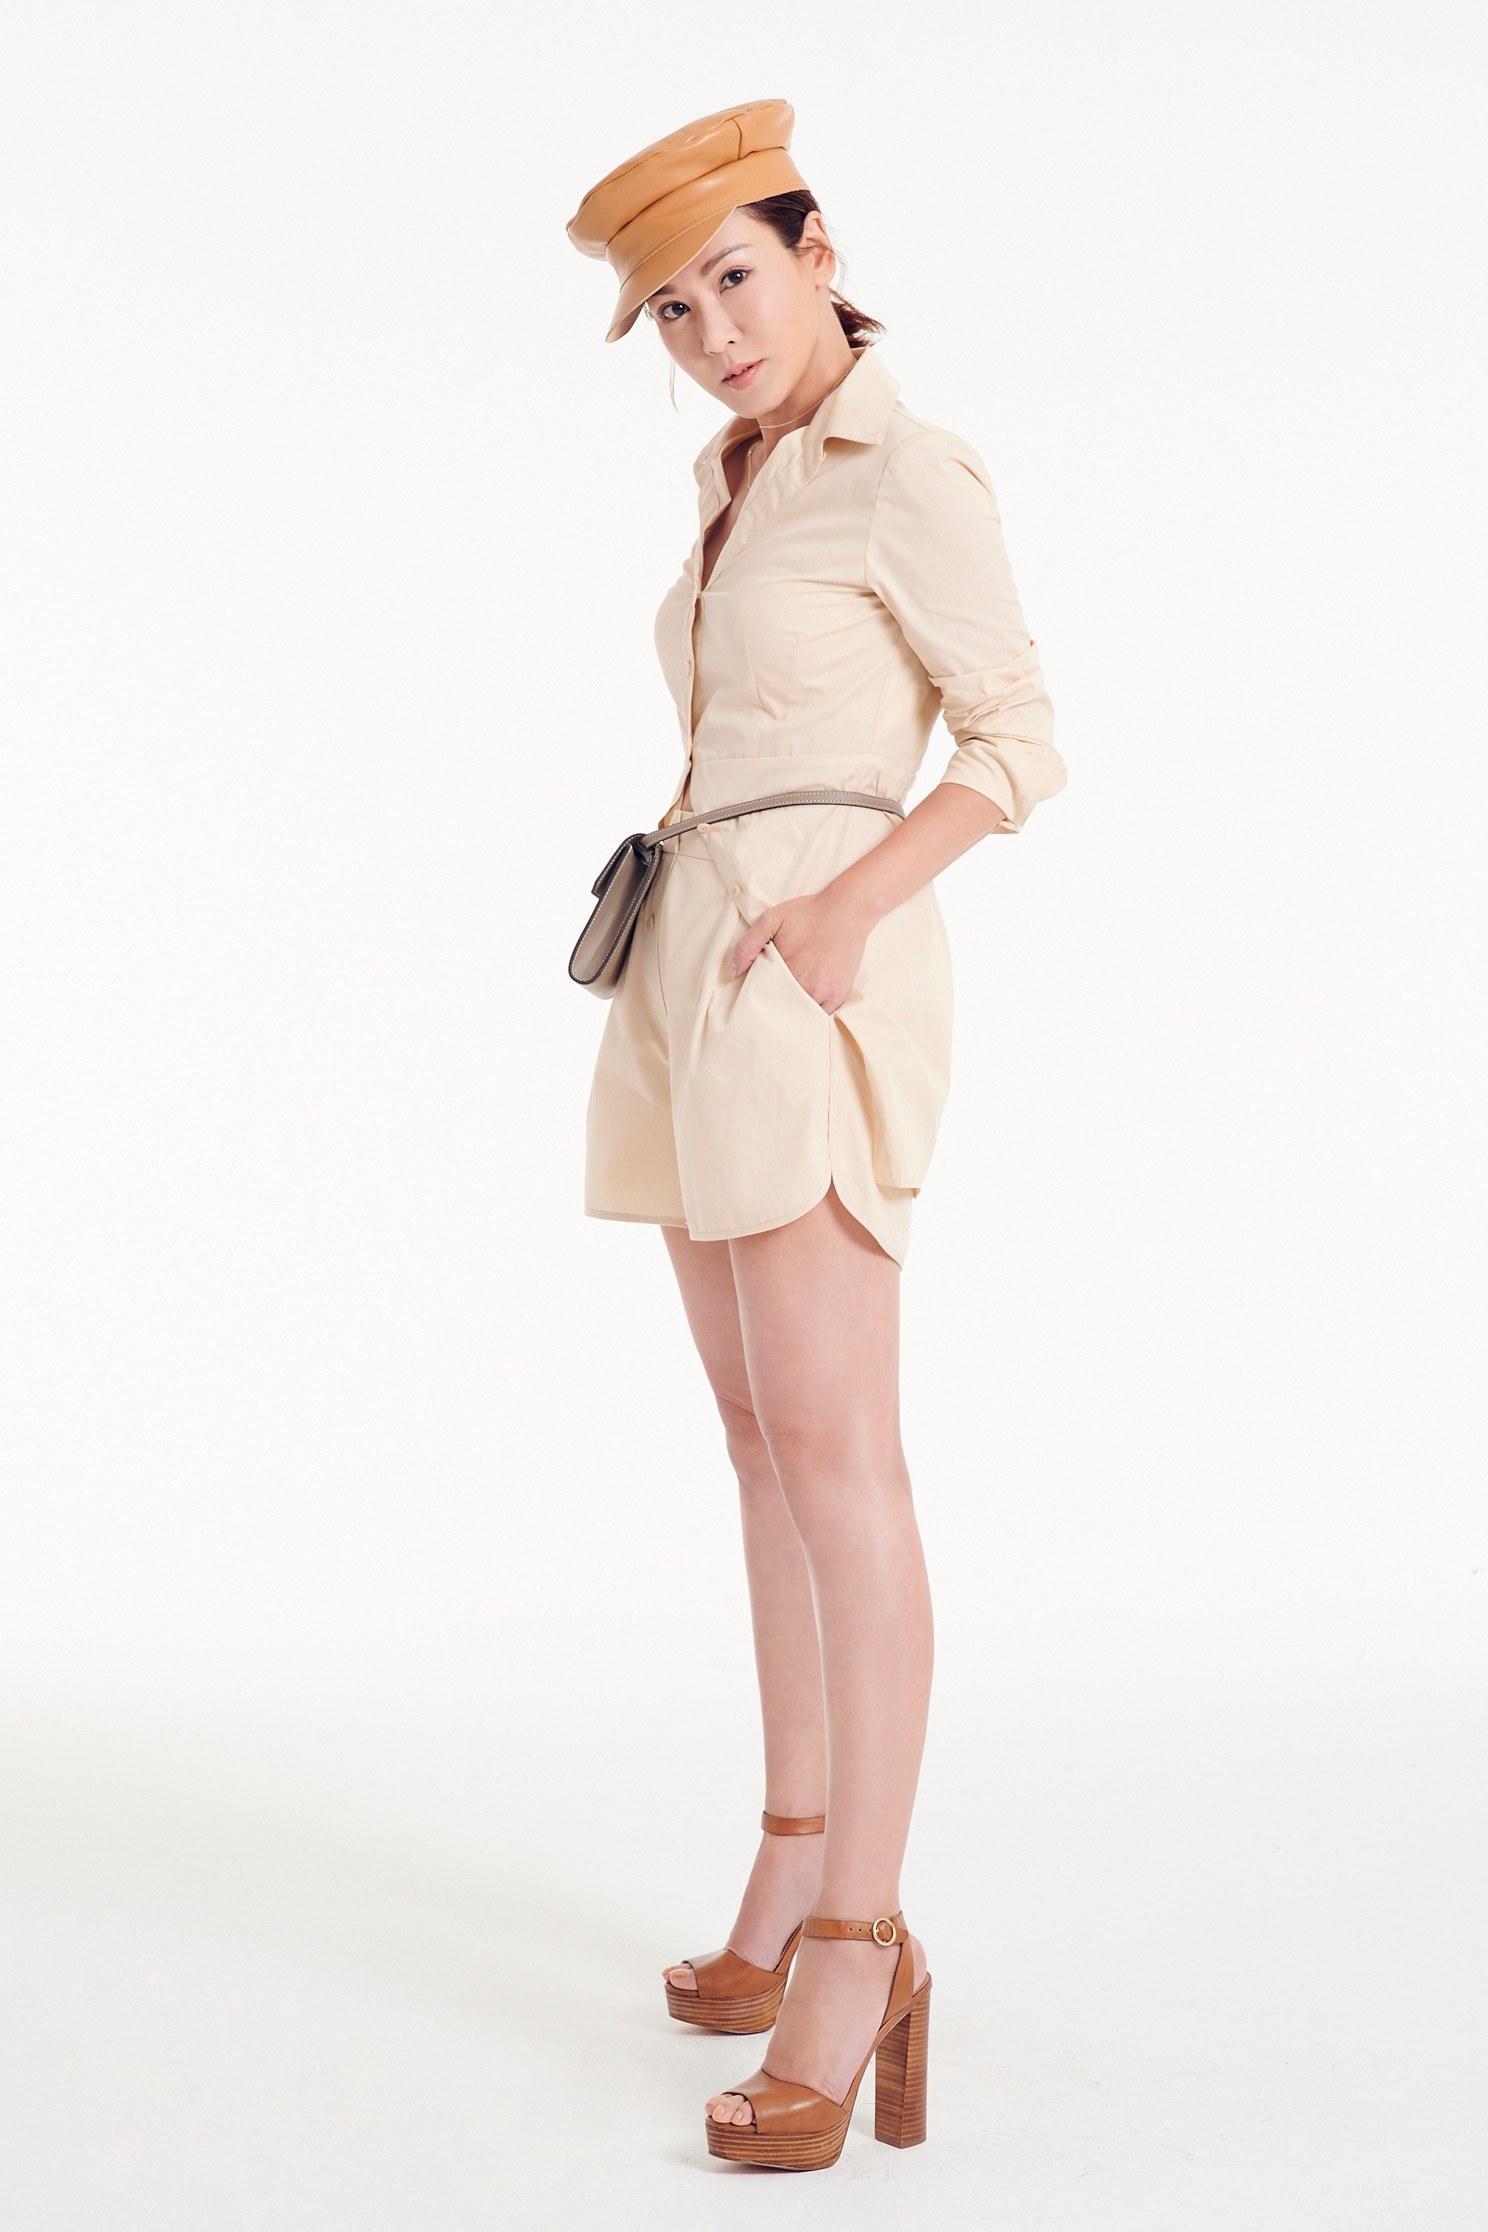 Shirt Shorts Set,top,onlinelimitededition,shorts,blouse